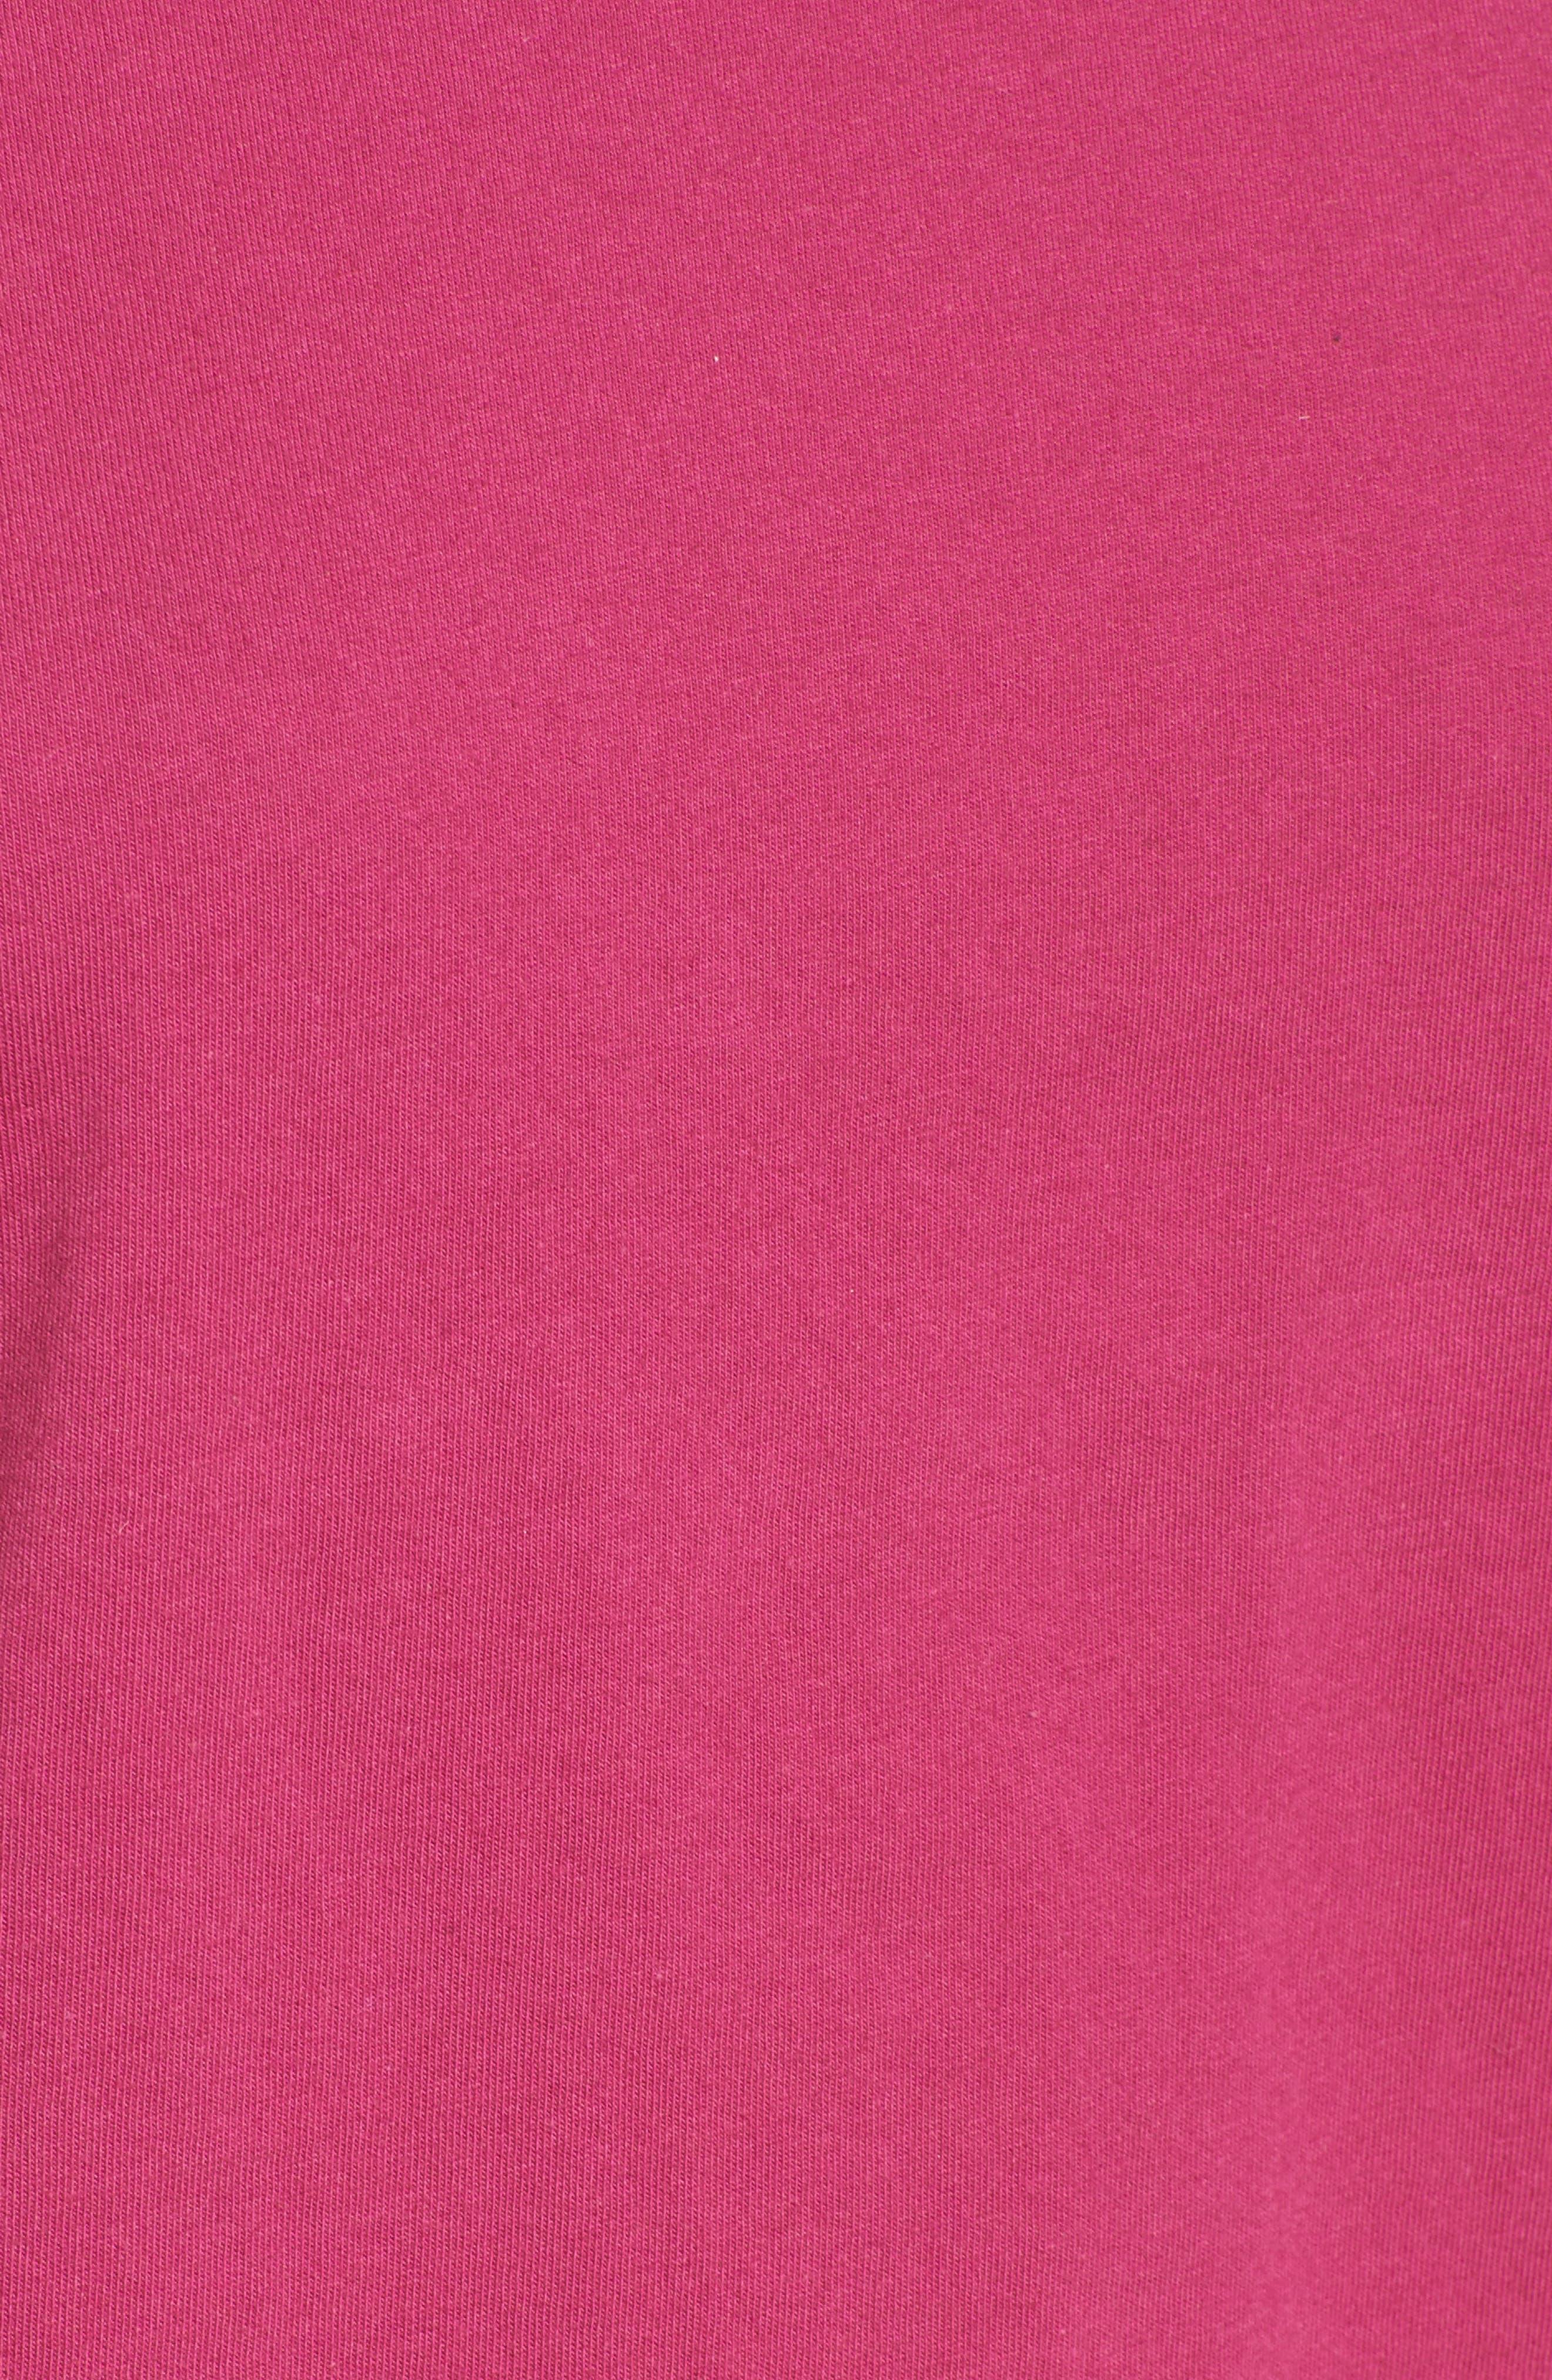 Bow Sleeve Poplin Cotton Top,                             Alternate thumbnail 5, color,                             Purple Boysen